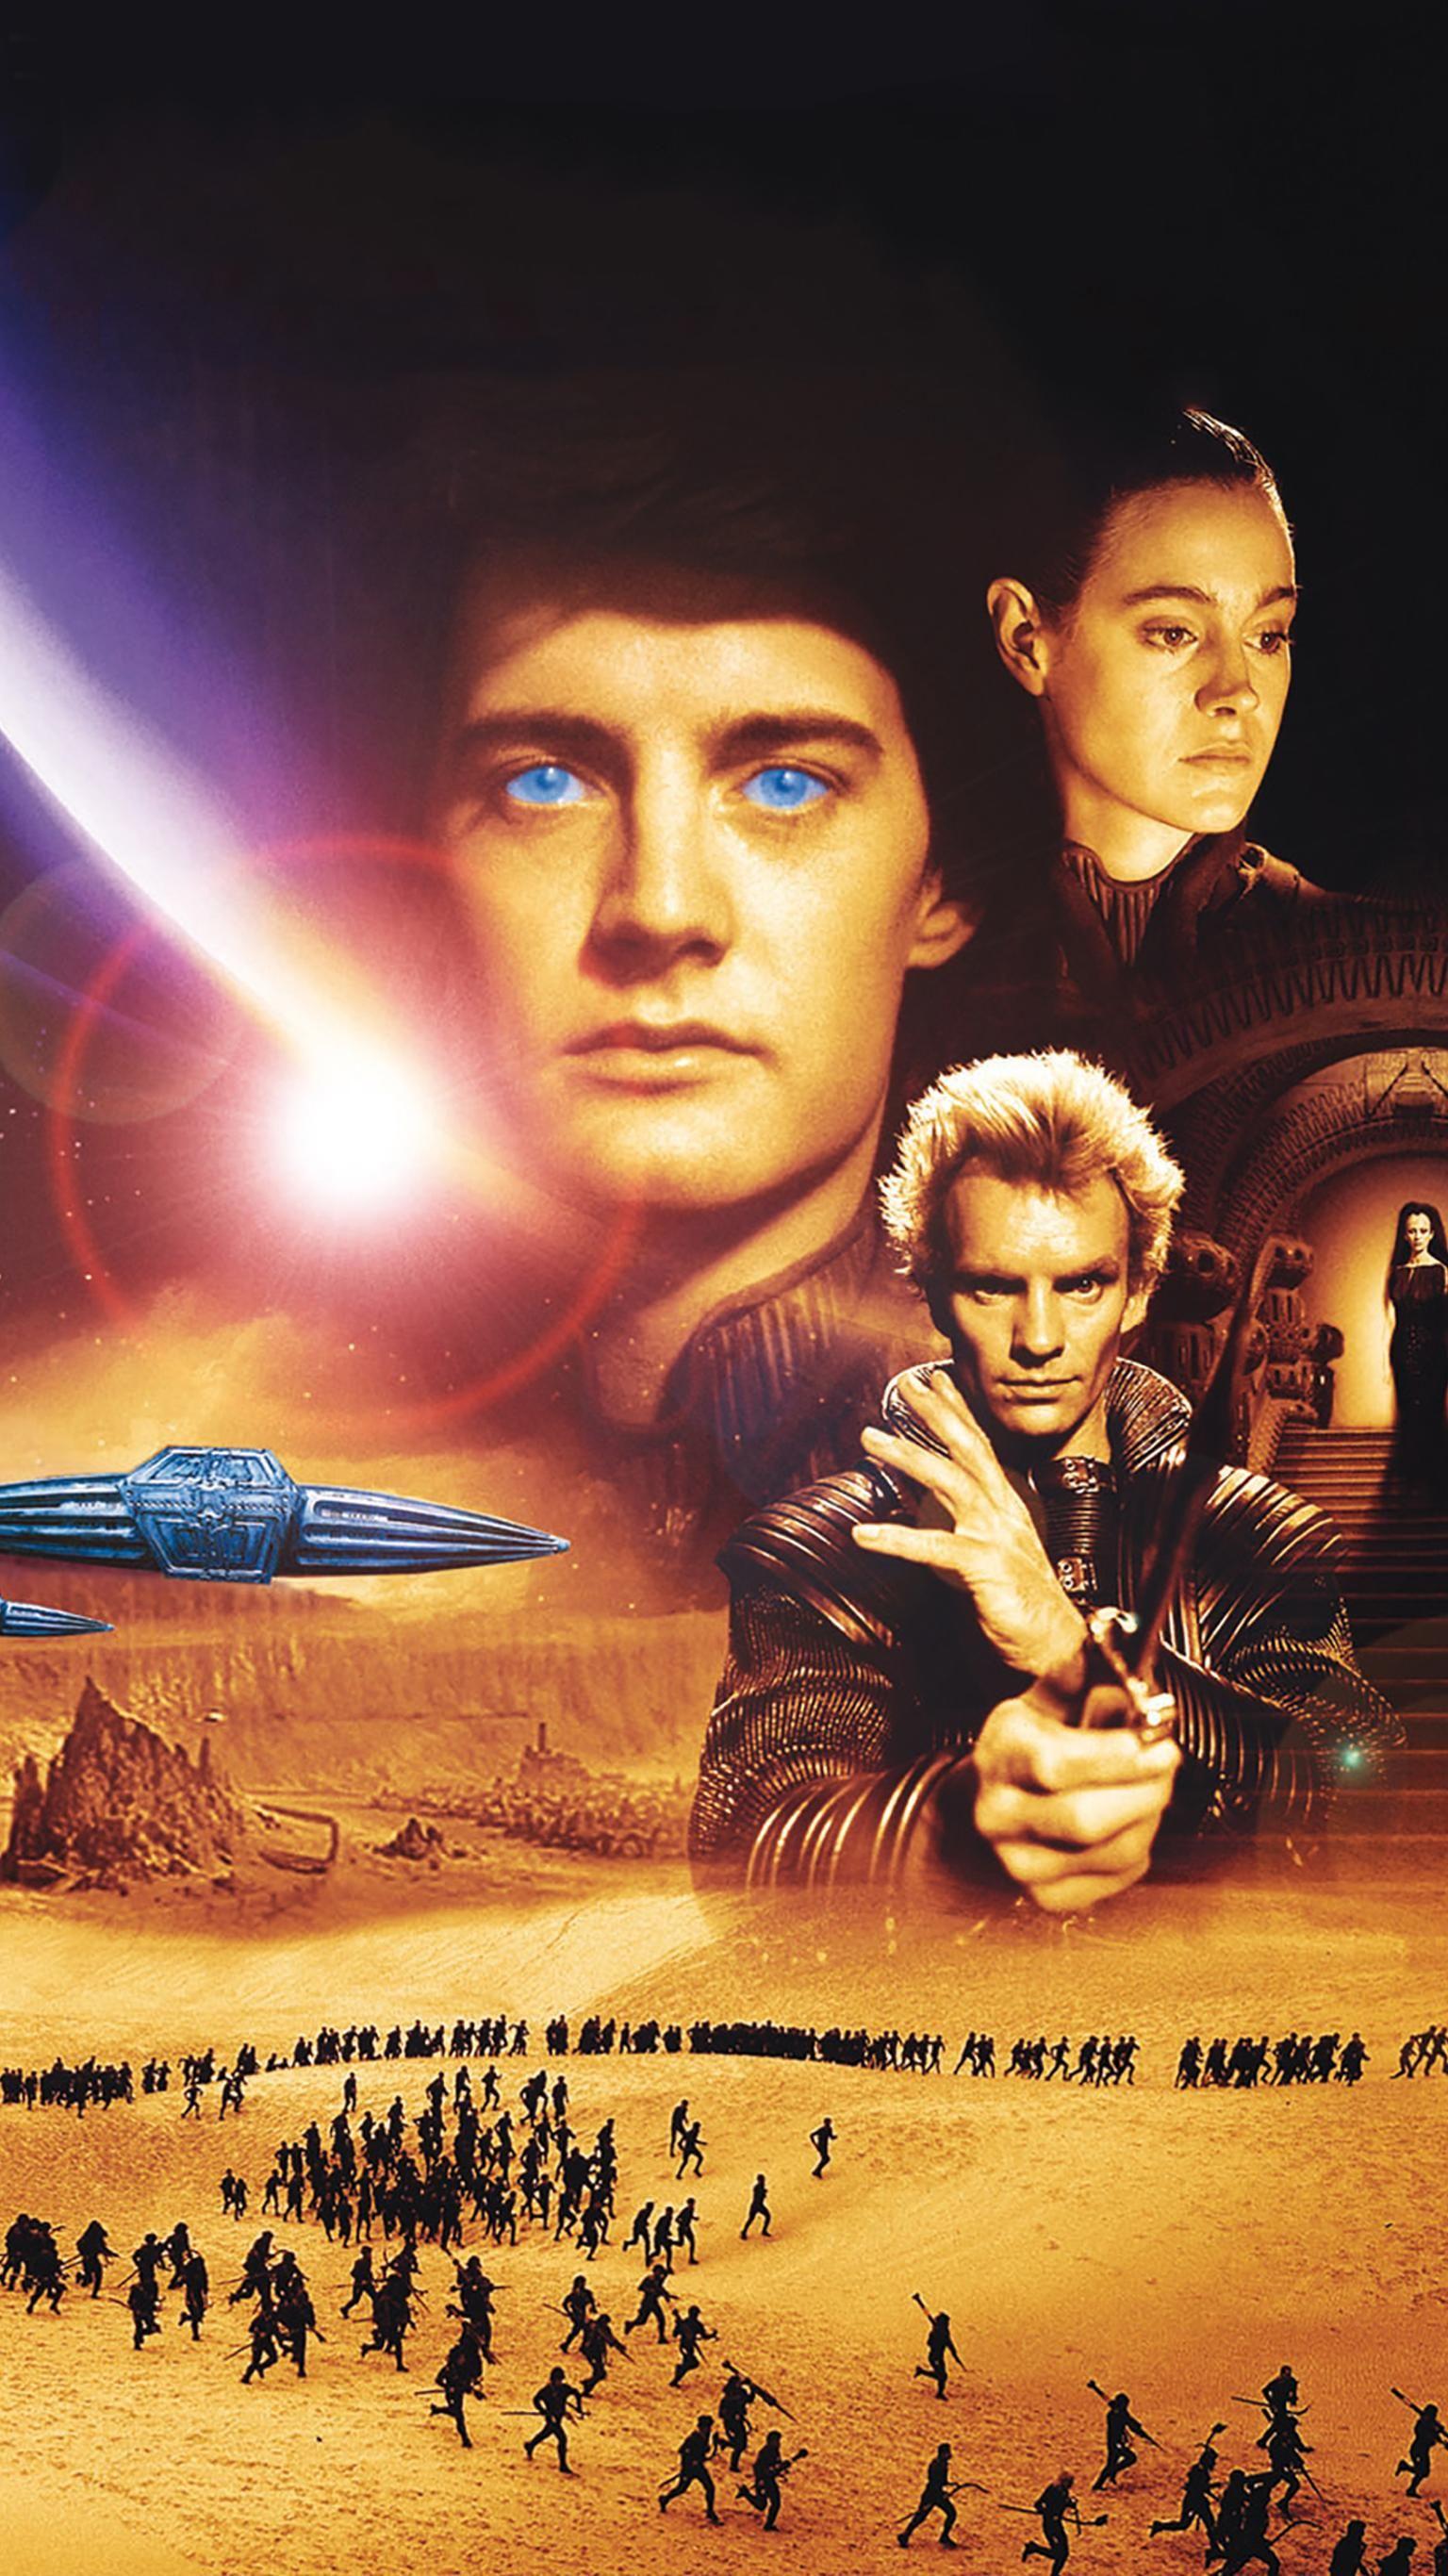 Dune 1984 Phone Wallpaper Moviemania Movie Poster Art Wallpaper Dune